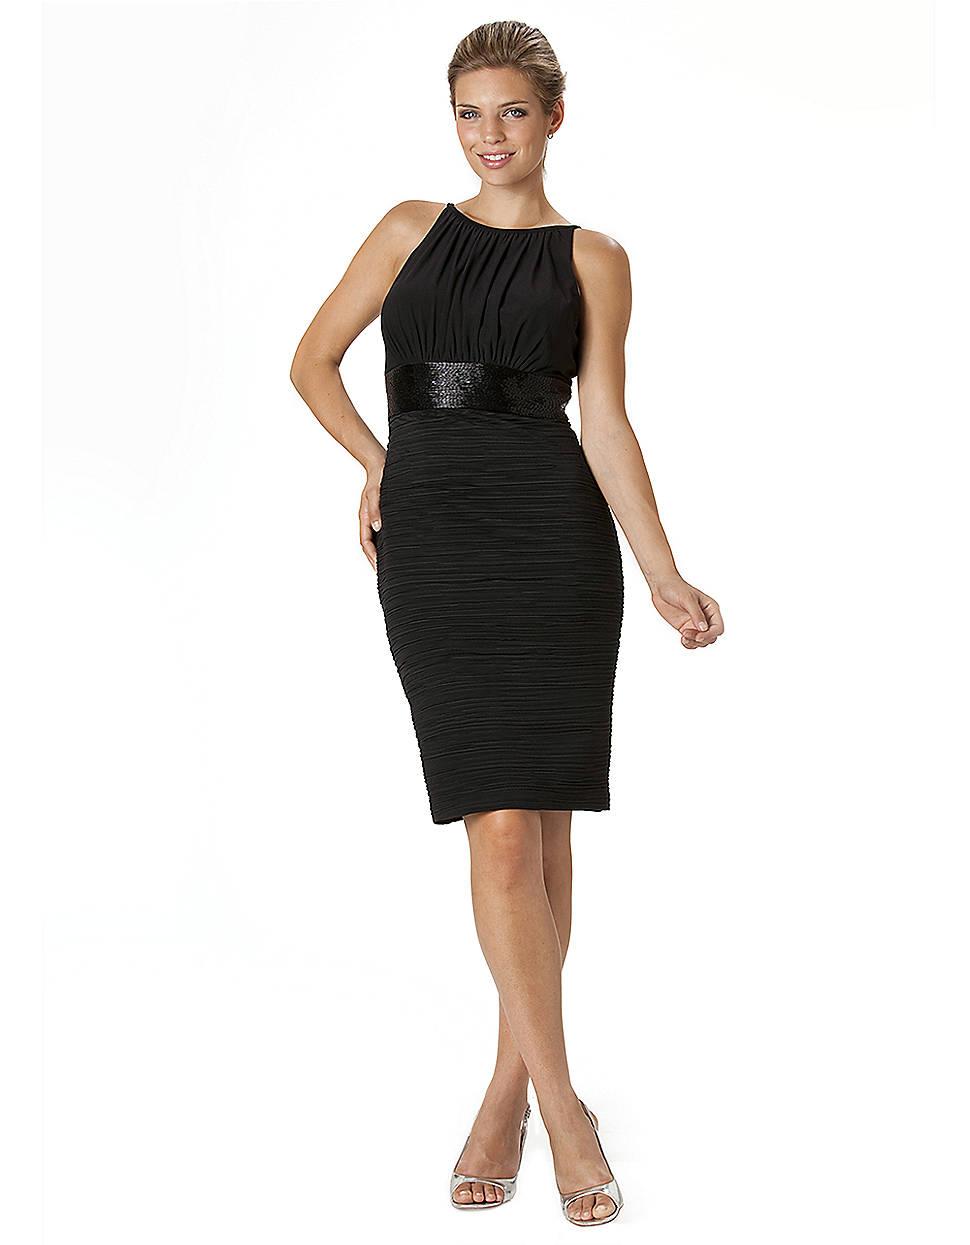 Js boutique black halter top ruched dress in black lyst for Boutique tops